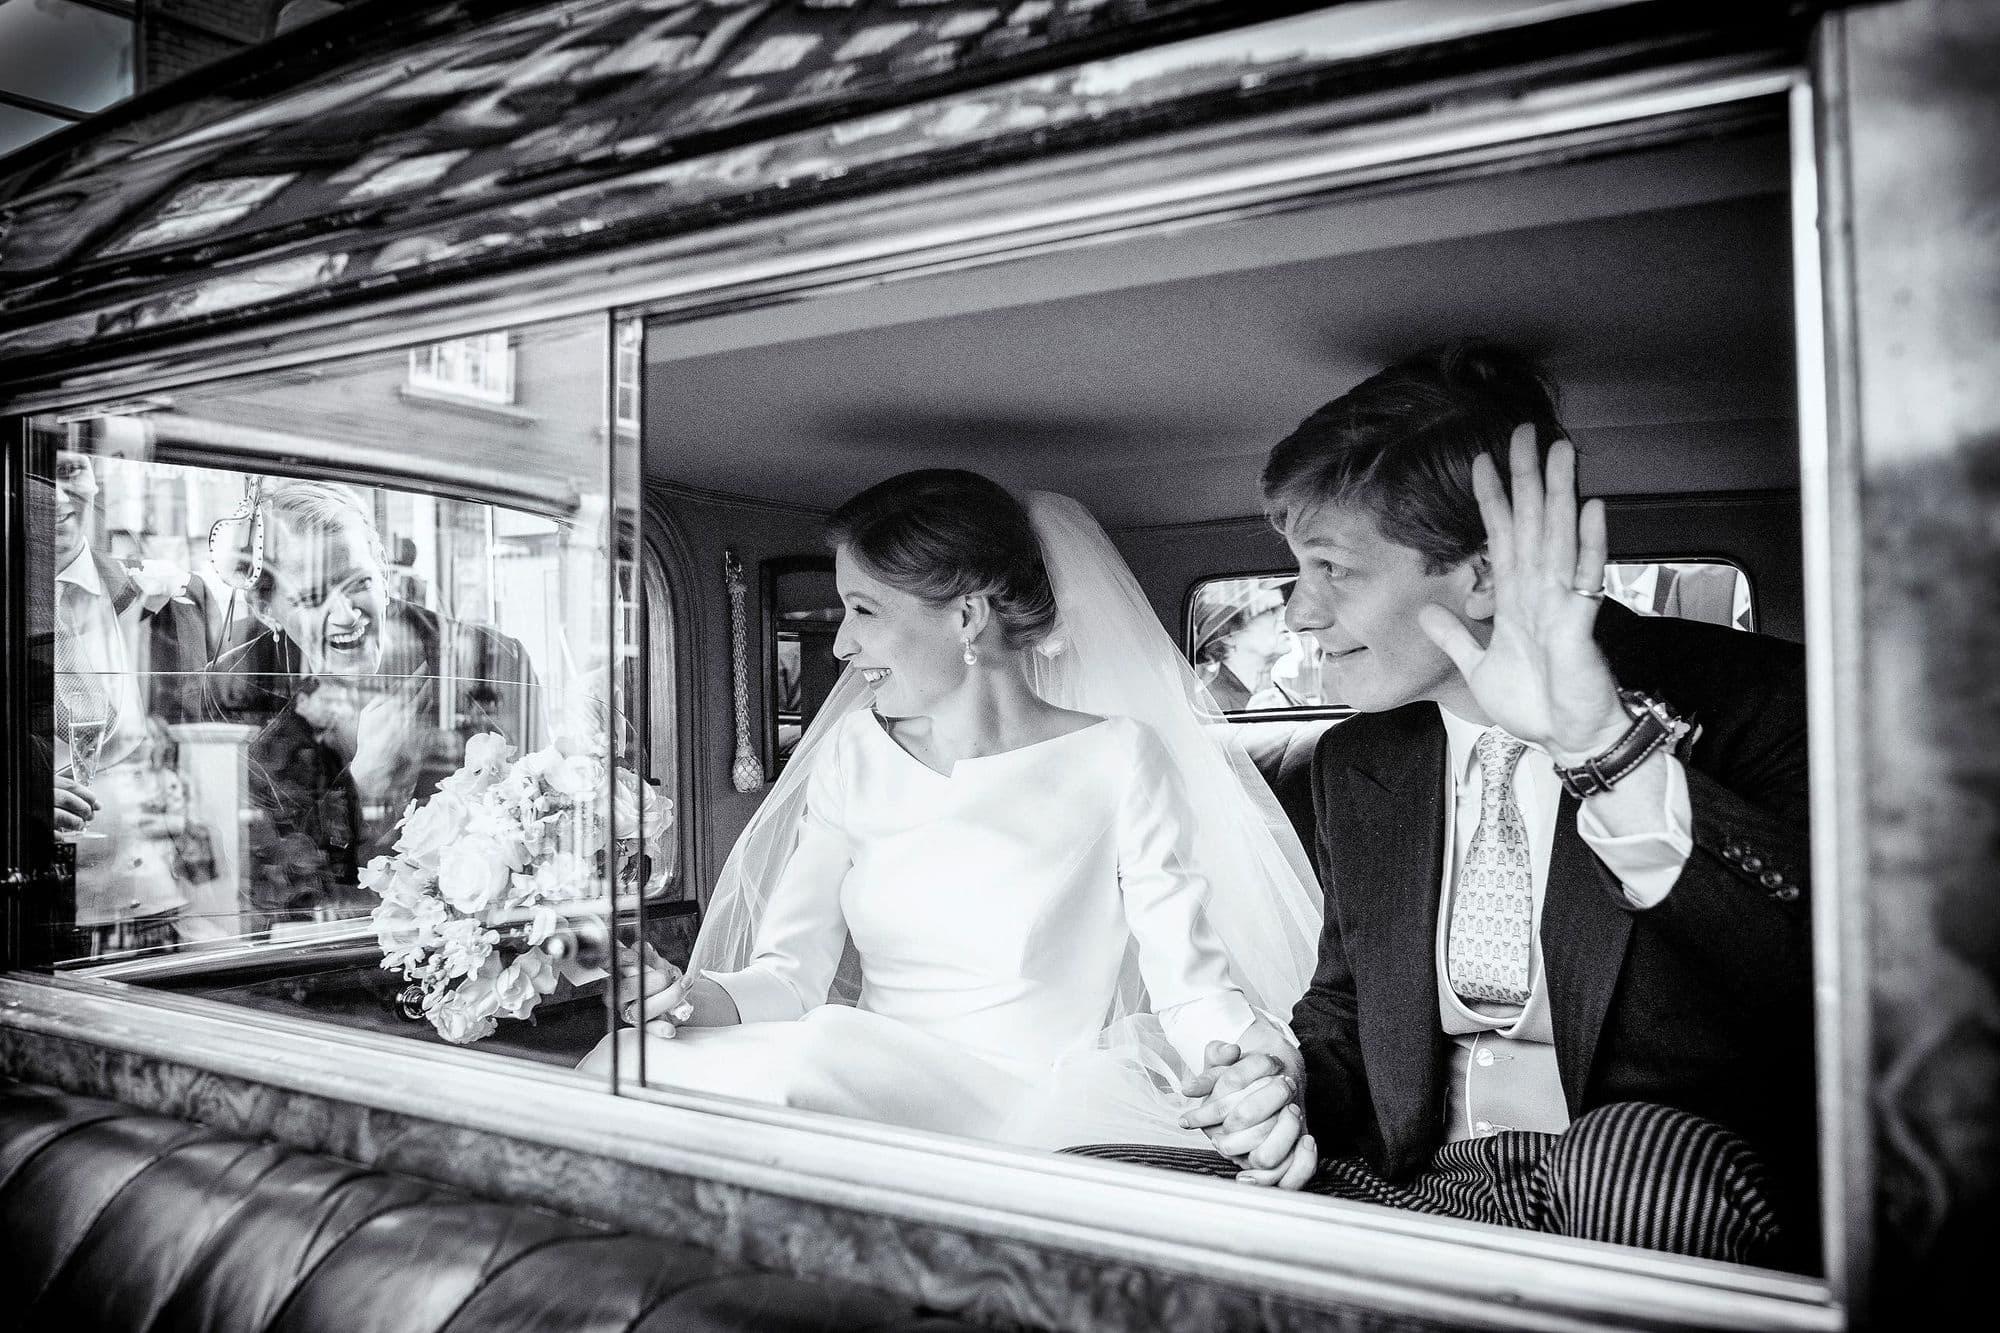 Mark-Seymour-Wedding-Photographer-UK-13 24